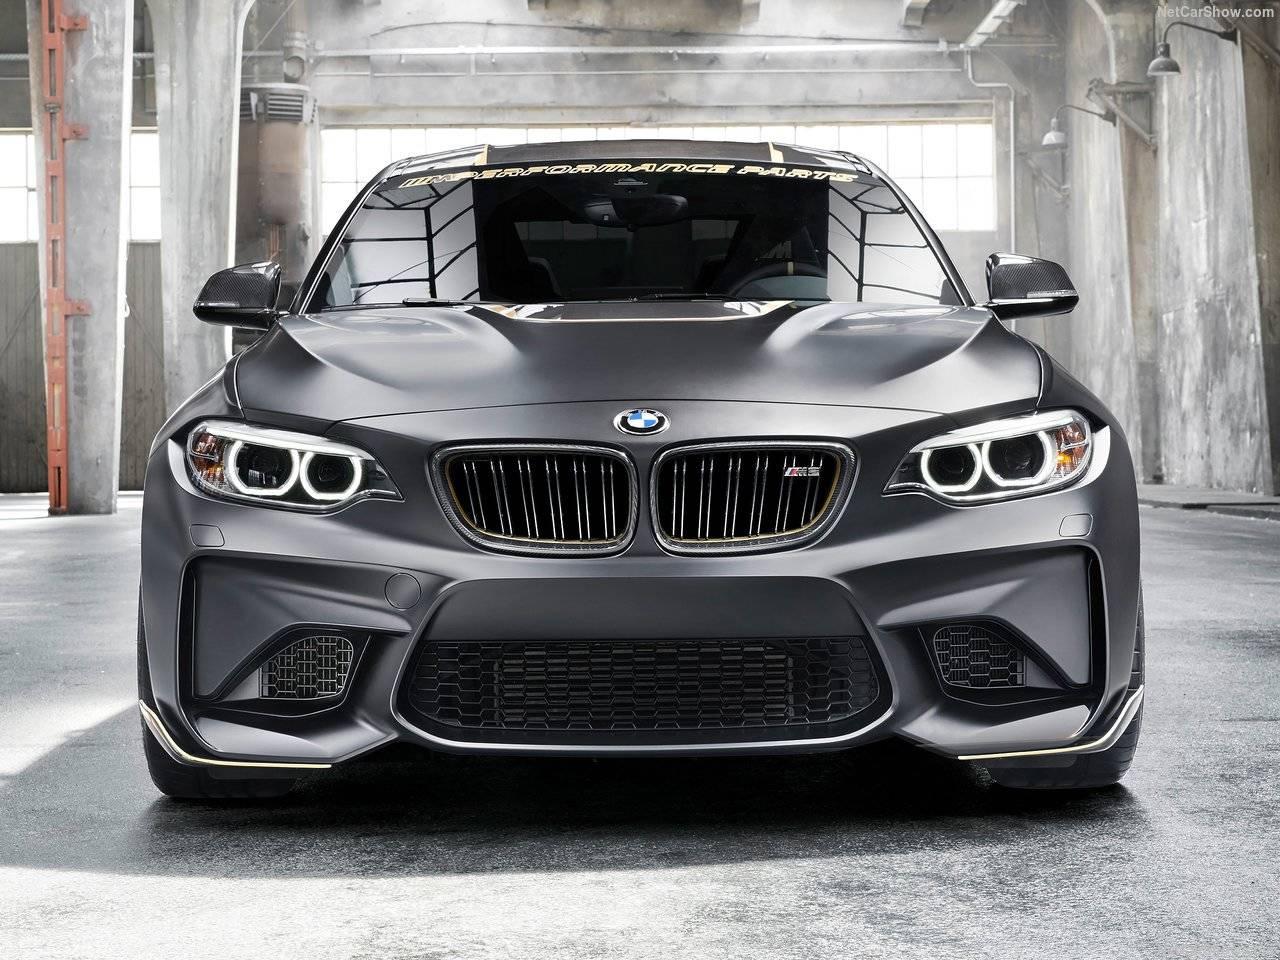 BMW M2 M-Performance-Parts Conceptが公開されました。 カーボン仕様で軽量化されパフォーマンスアップ!